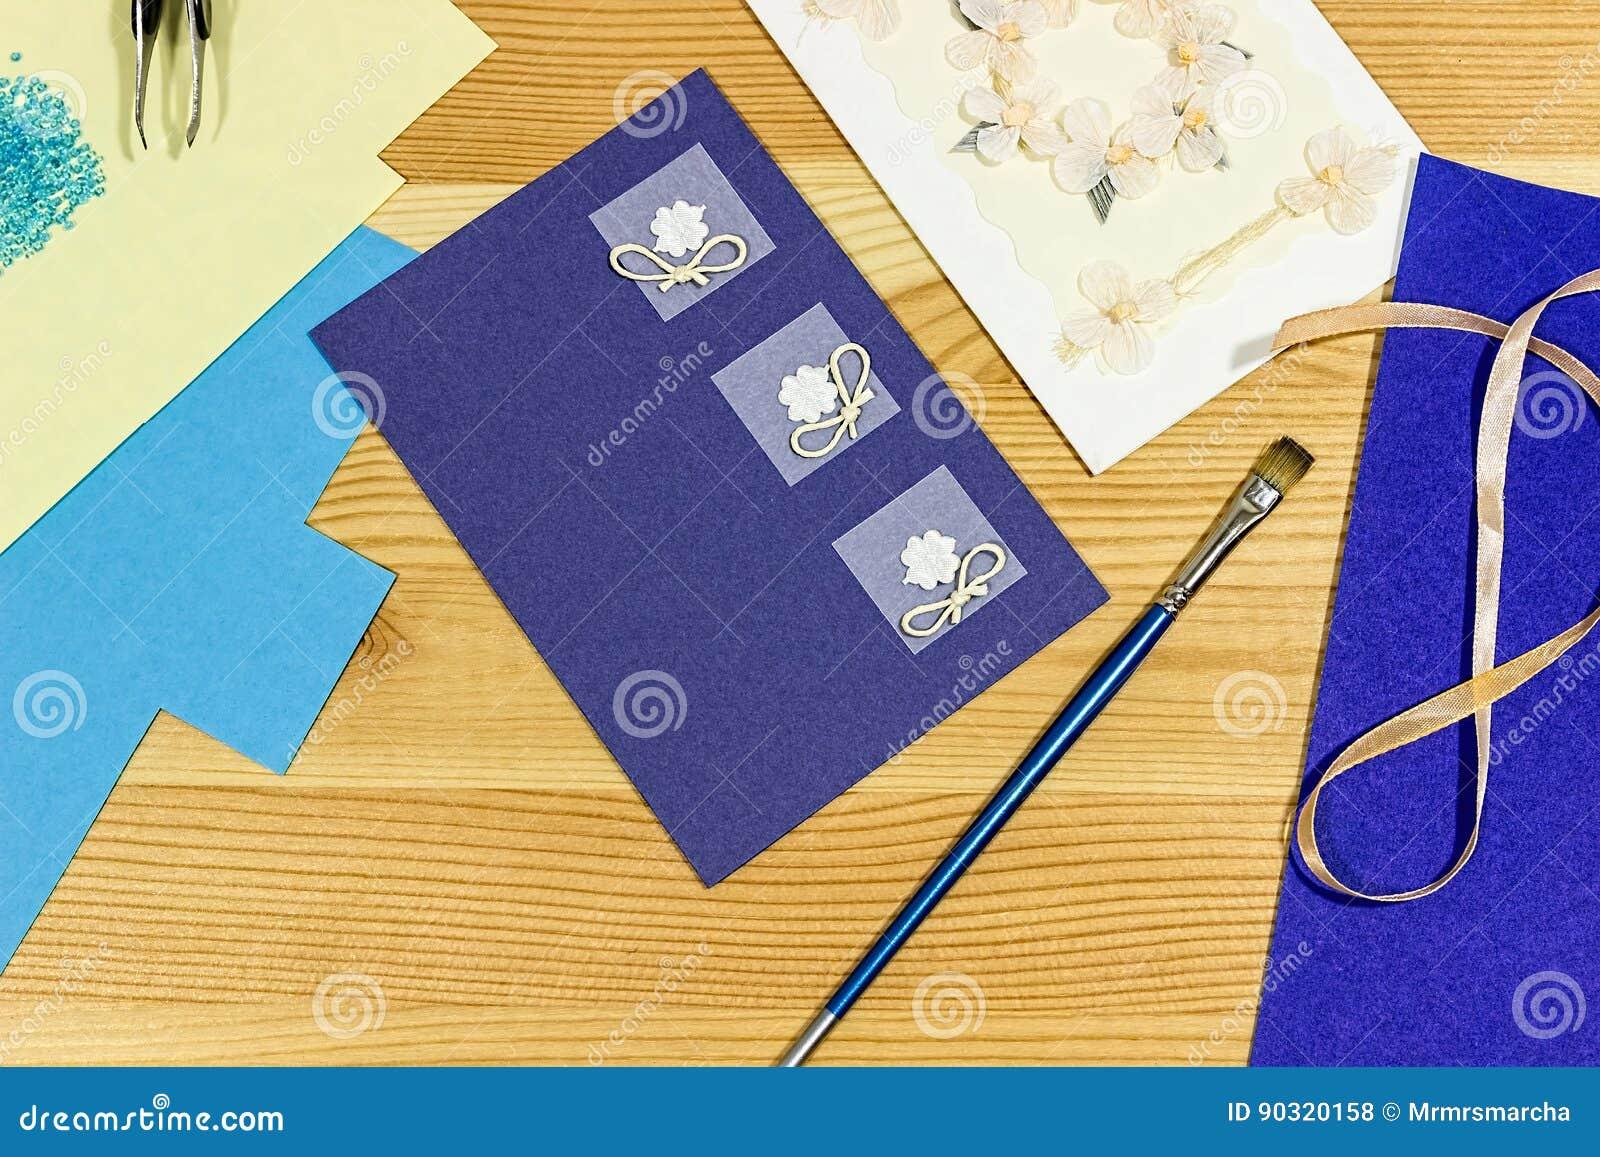 Craft Making Making A Greeting Card Stock Photo Image Of Craft